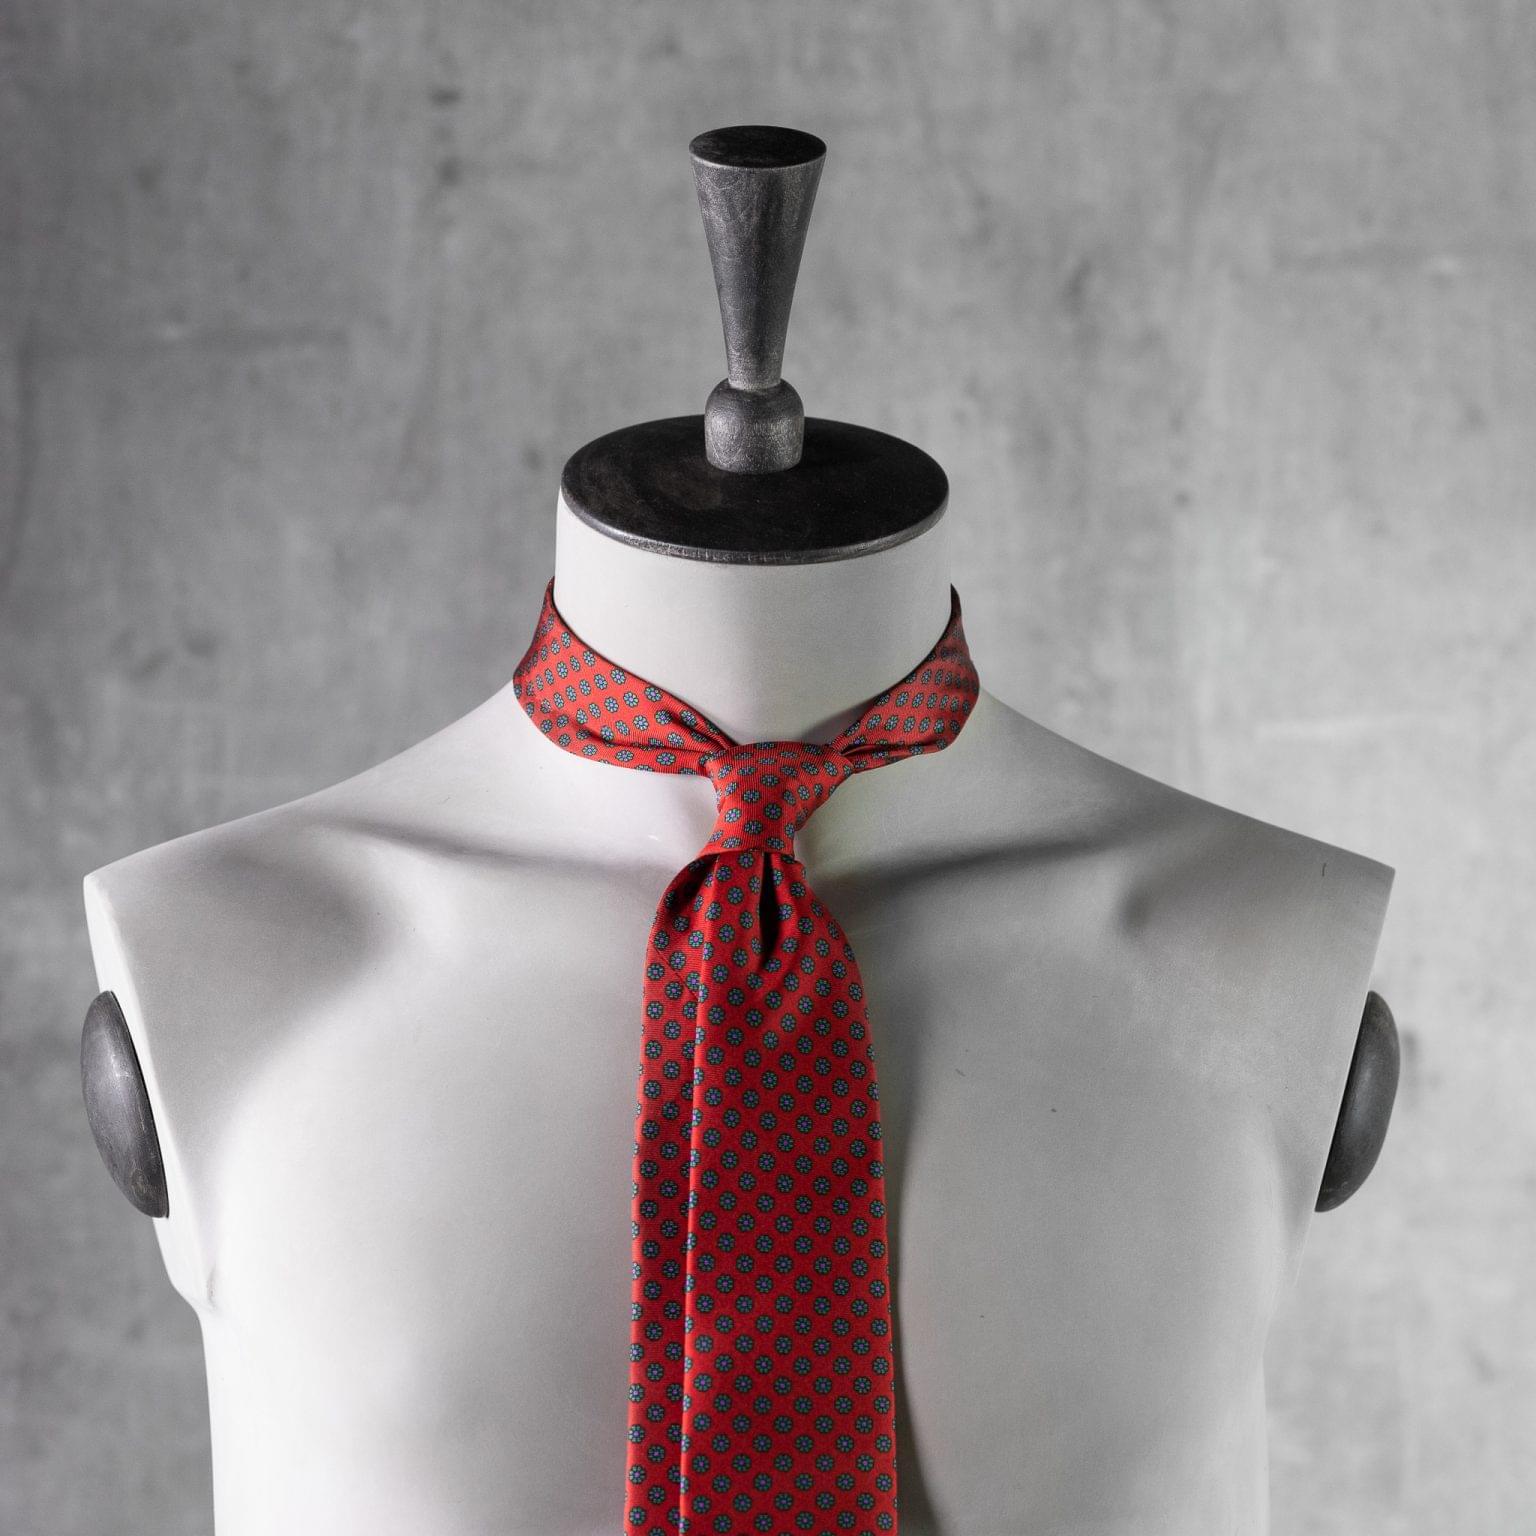 PRINTED-SILK-SEDA-ESTAMPADA-0537-Tie-Initials-Corbata-Iniciales-The-Seelk-3